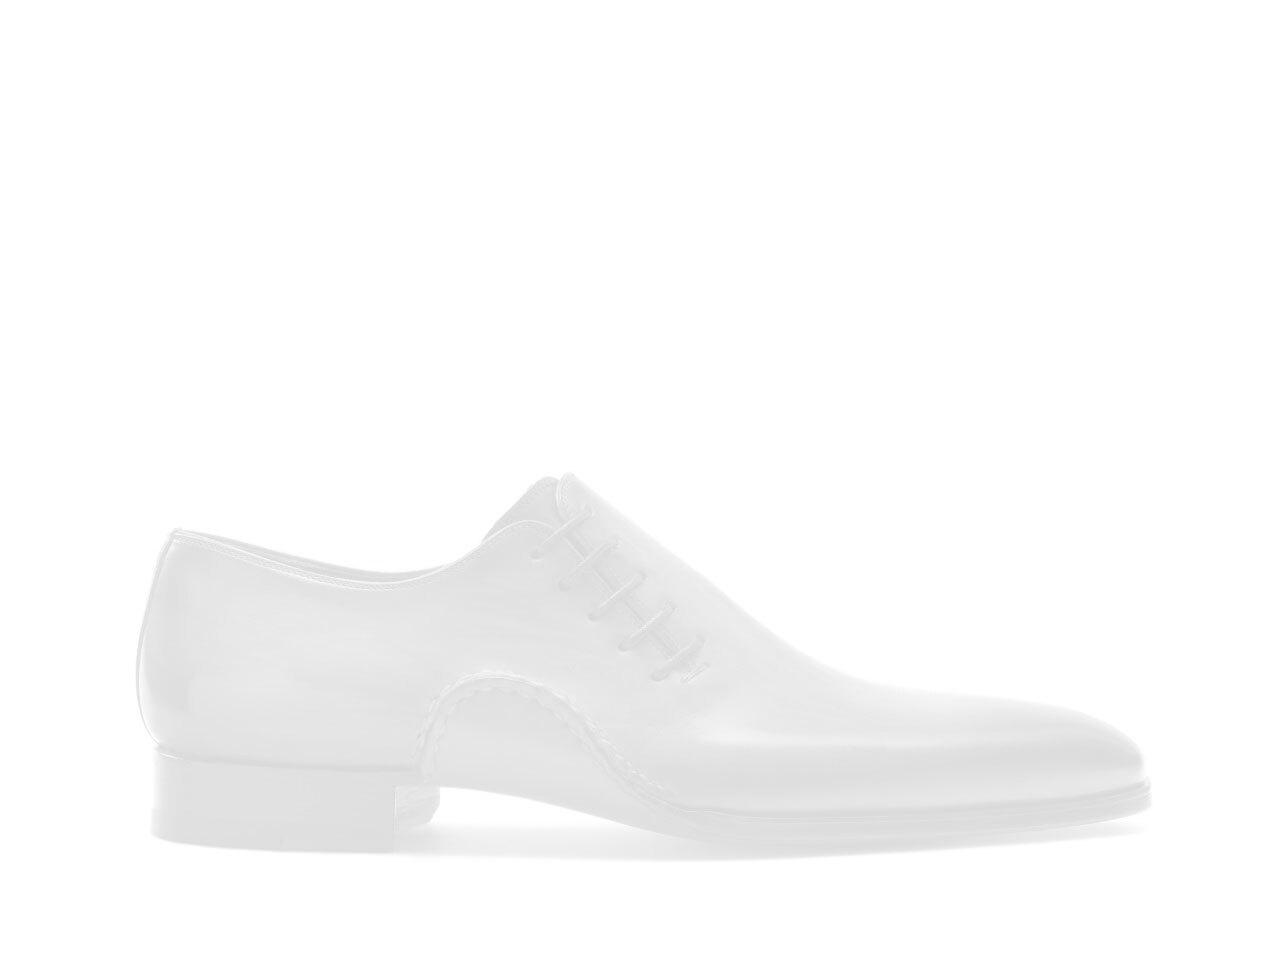 Pair of the Magnanni Ledger Curri Men's Oxford Shoes